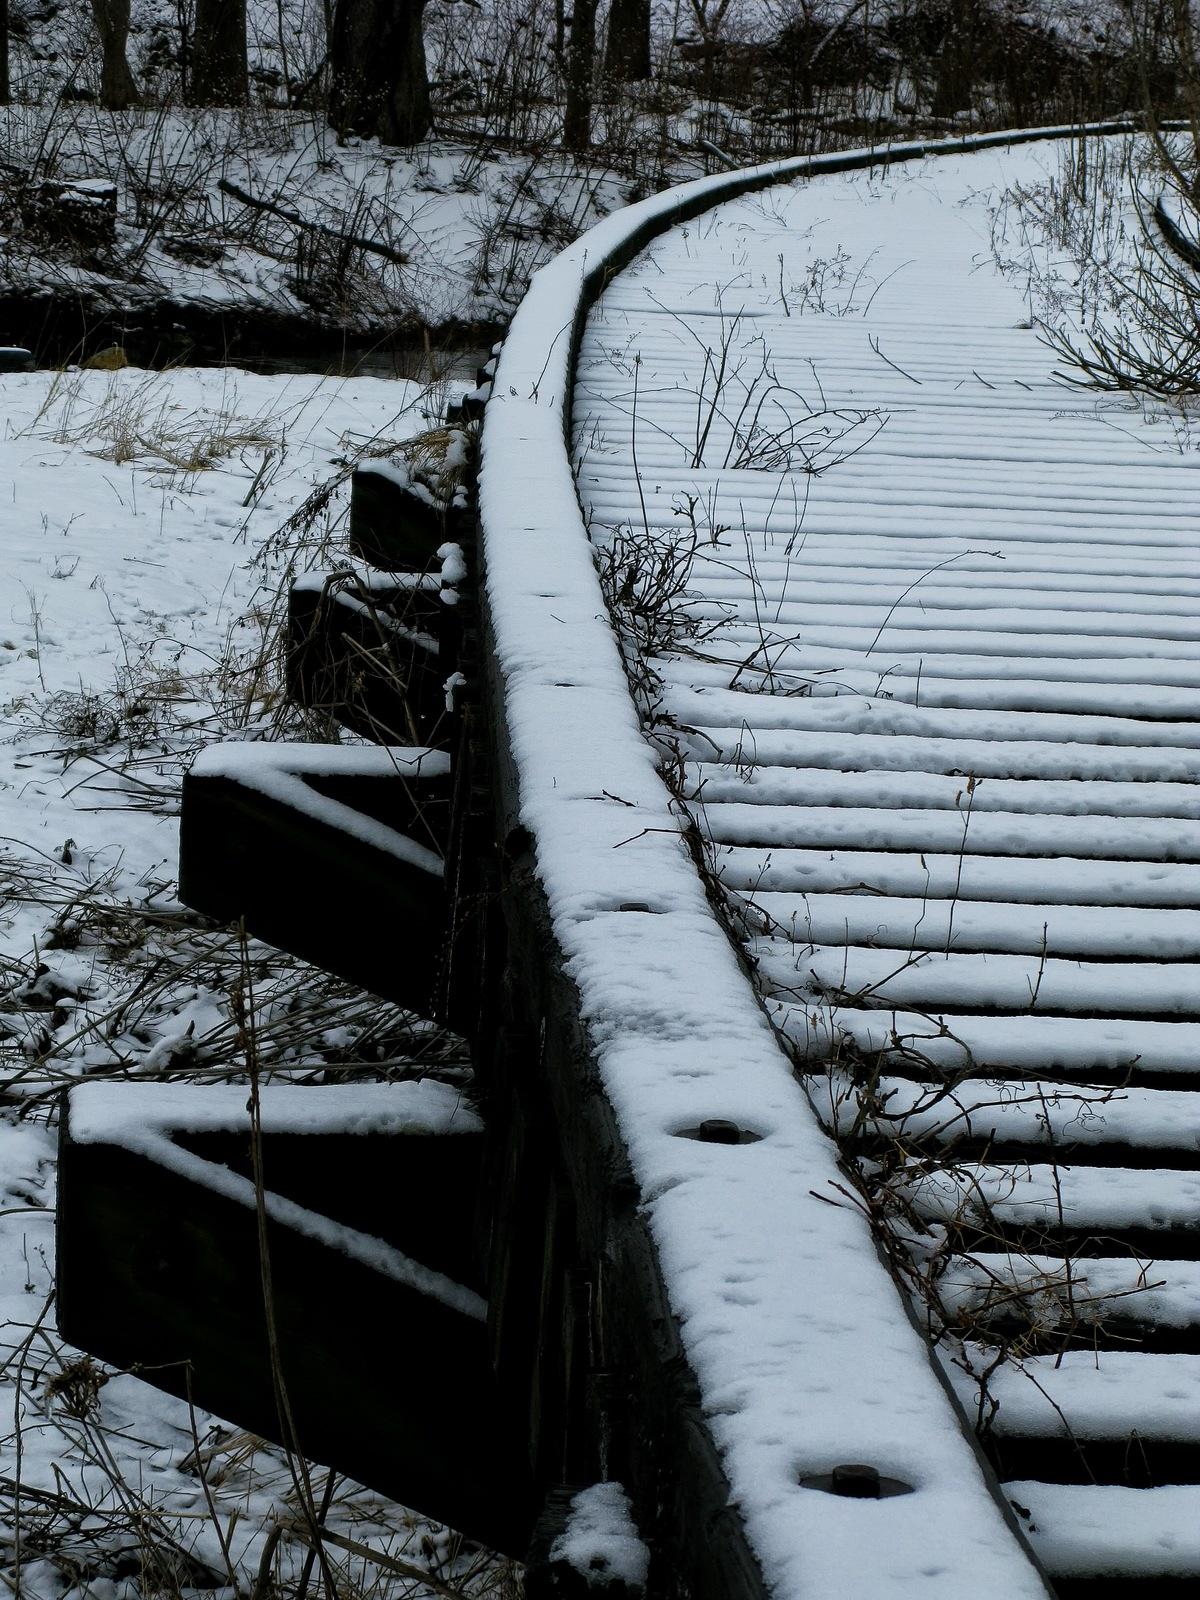 pennsylvania, allentown, winter, bridge, little lehigh river, the barber quarry railroad,, photo